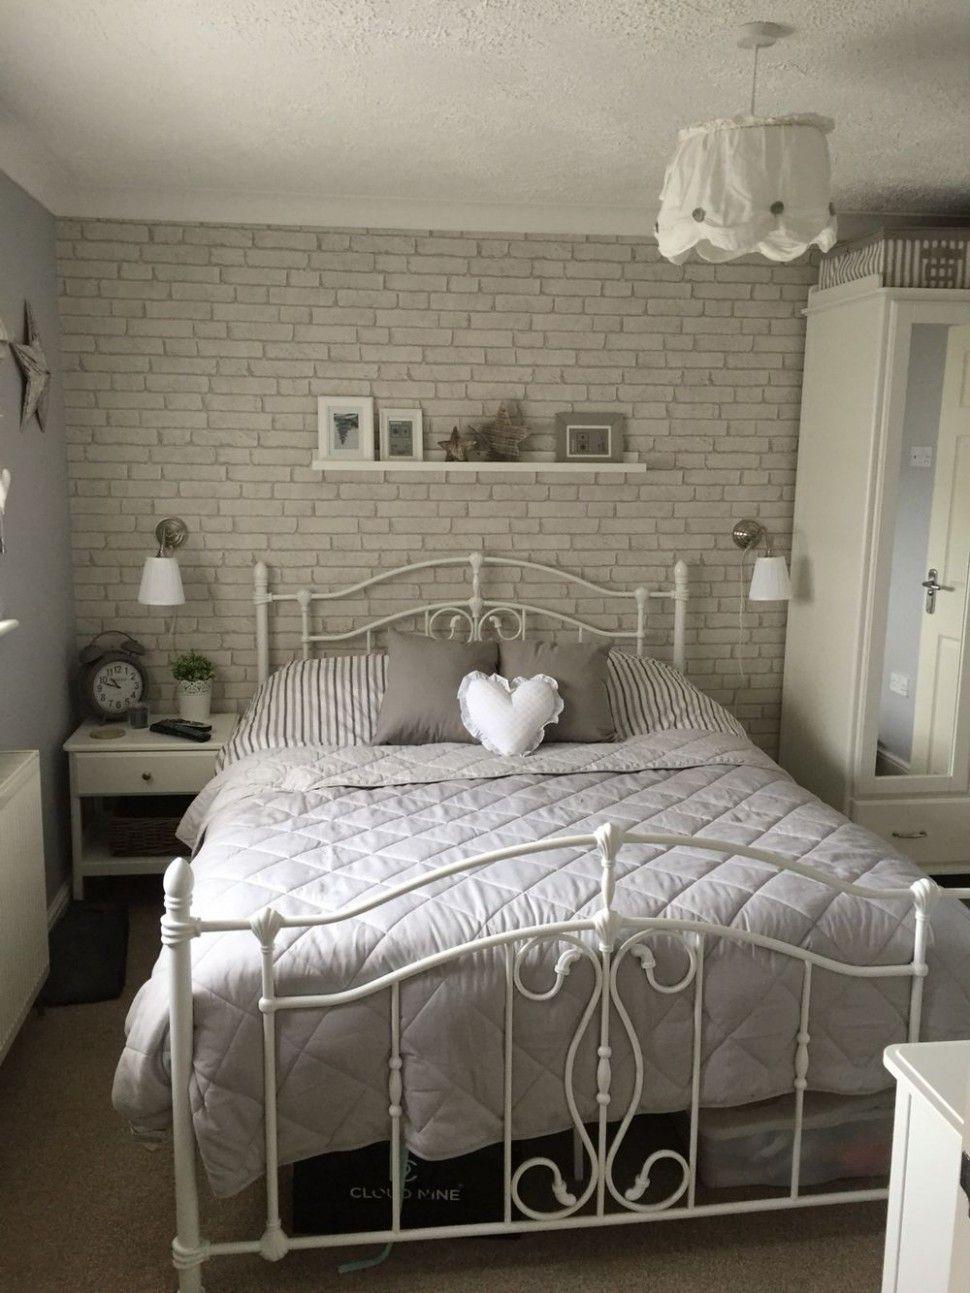 Grey Brick Wallpaper Bedroom Ideas In 2020 White Brick Wallpaper Bedroom Brick Wallpaper Bedroom White Bedroom Decor